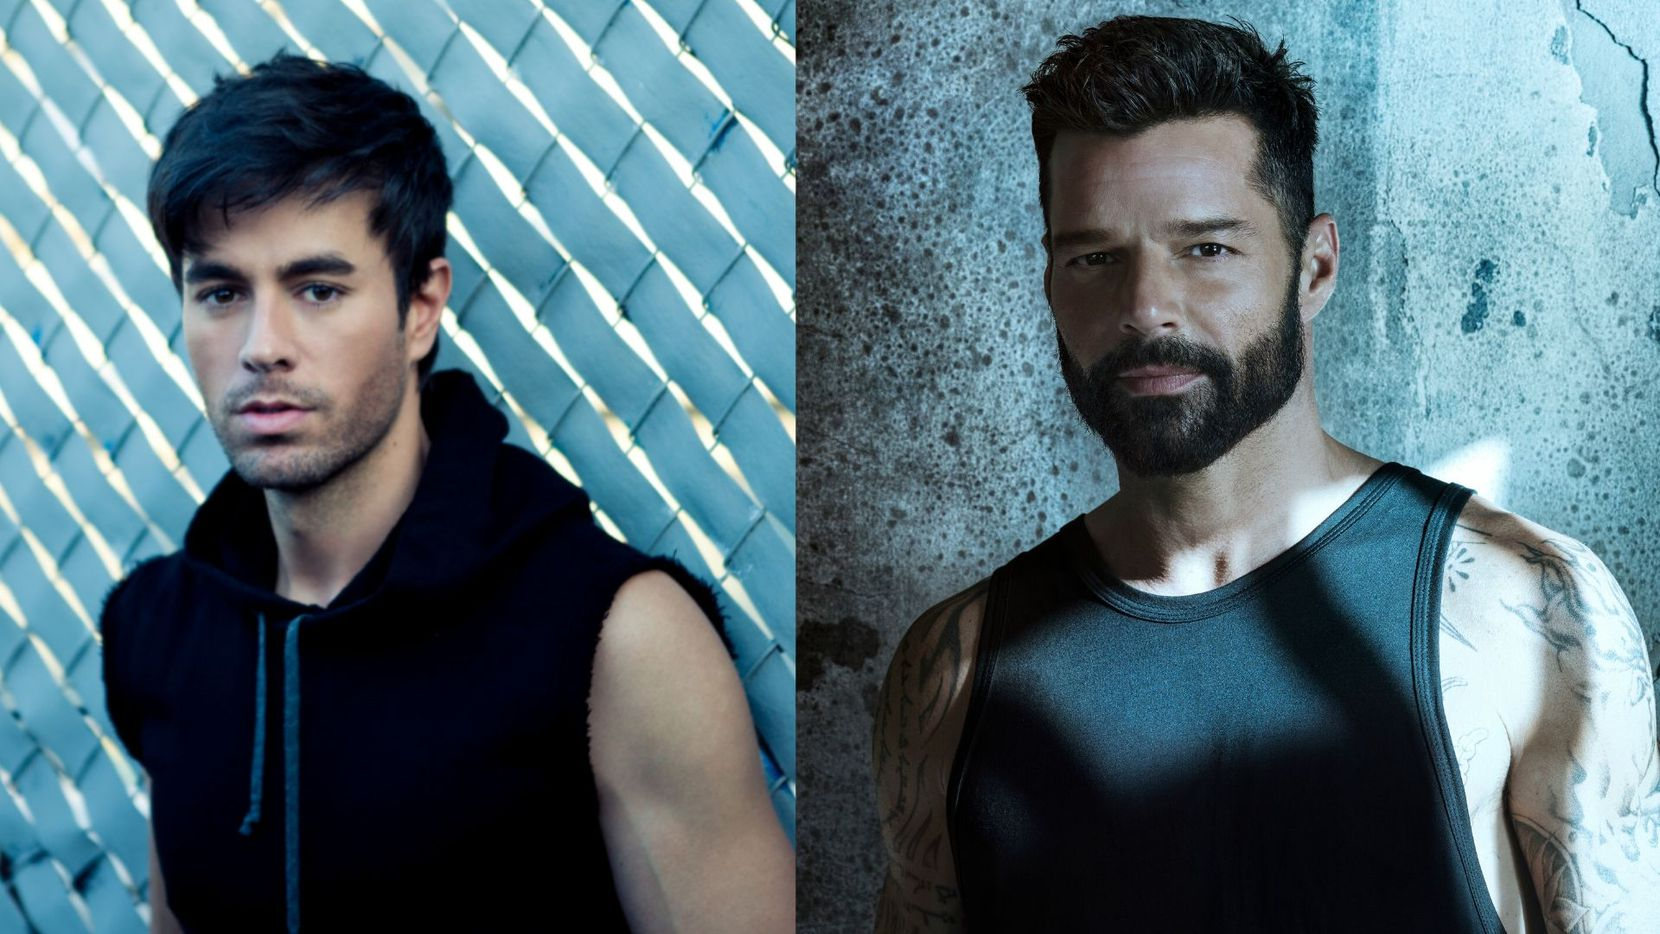 Enrique Iglesias y Ricky Martin traen gira conjunta a Dallas.